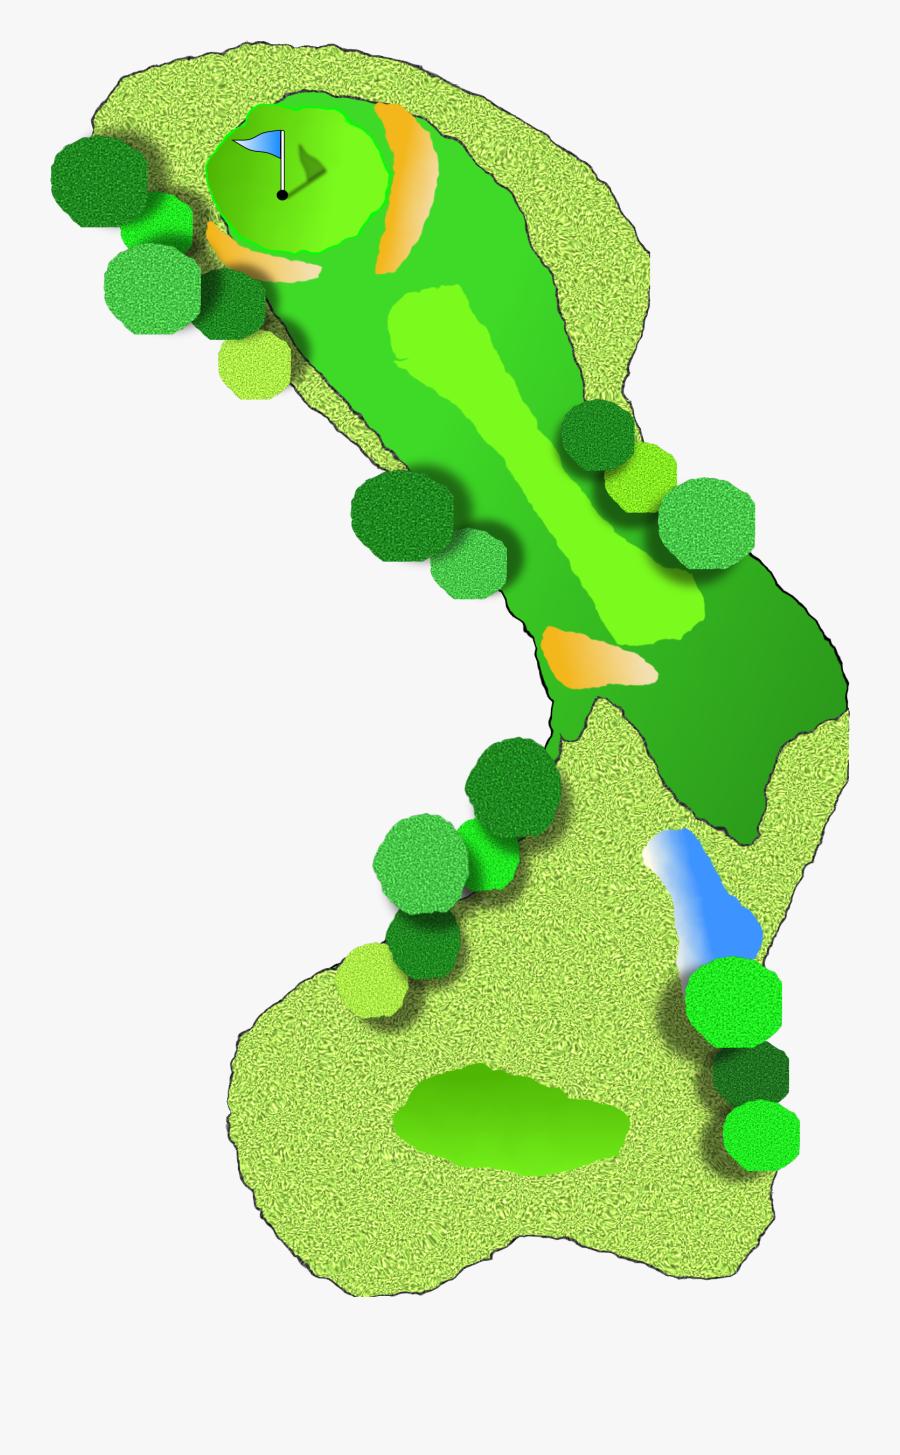 Golf Club Golf Course Clipart Widescreen Clipartfox - Transparent Golf Course Clipart, Transparent Clipart